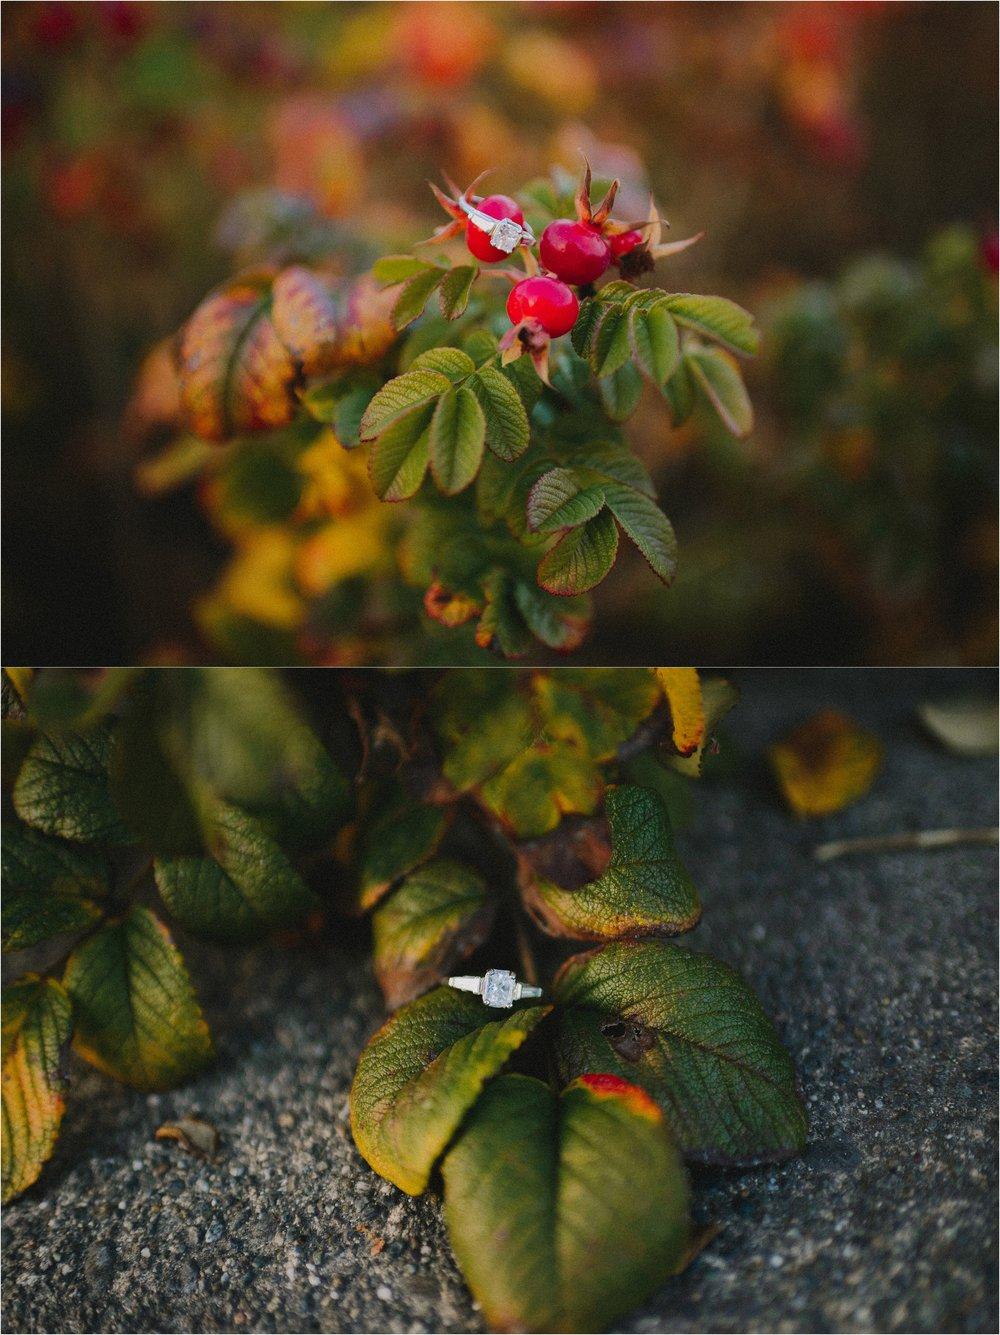 titlow-beach-park-engagement-session-jannicka-mayte-anchorage-alaska-wedding-photographer_0021.jpg